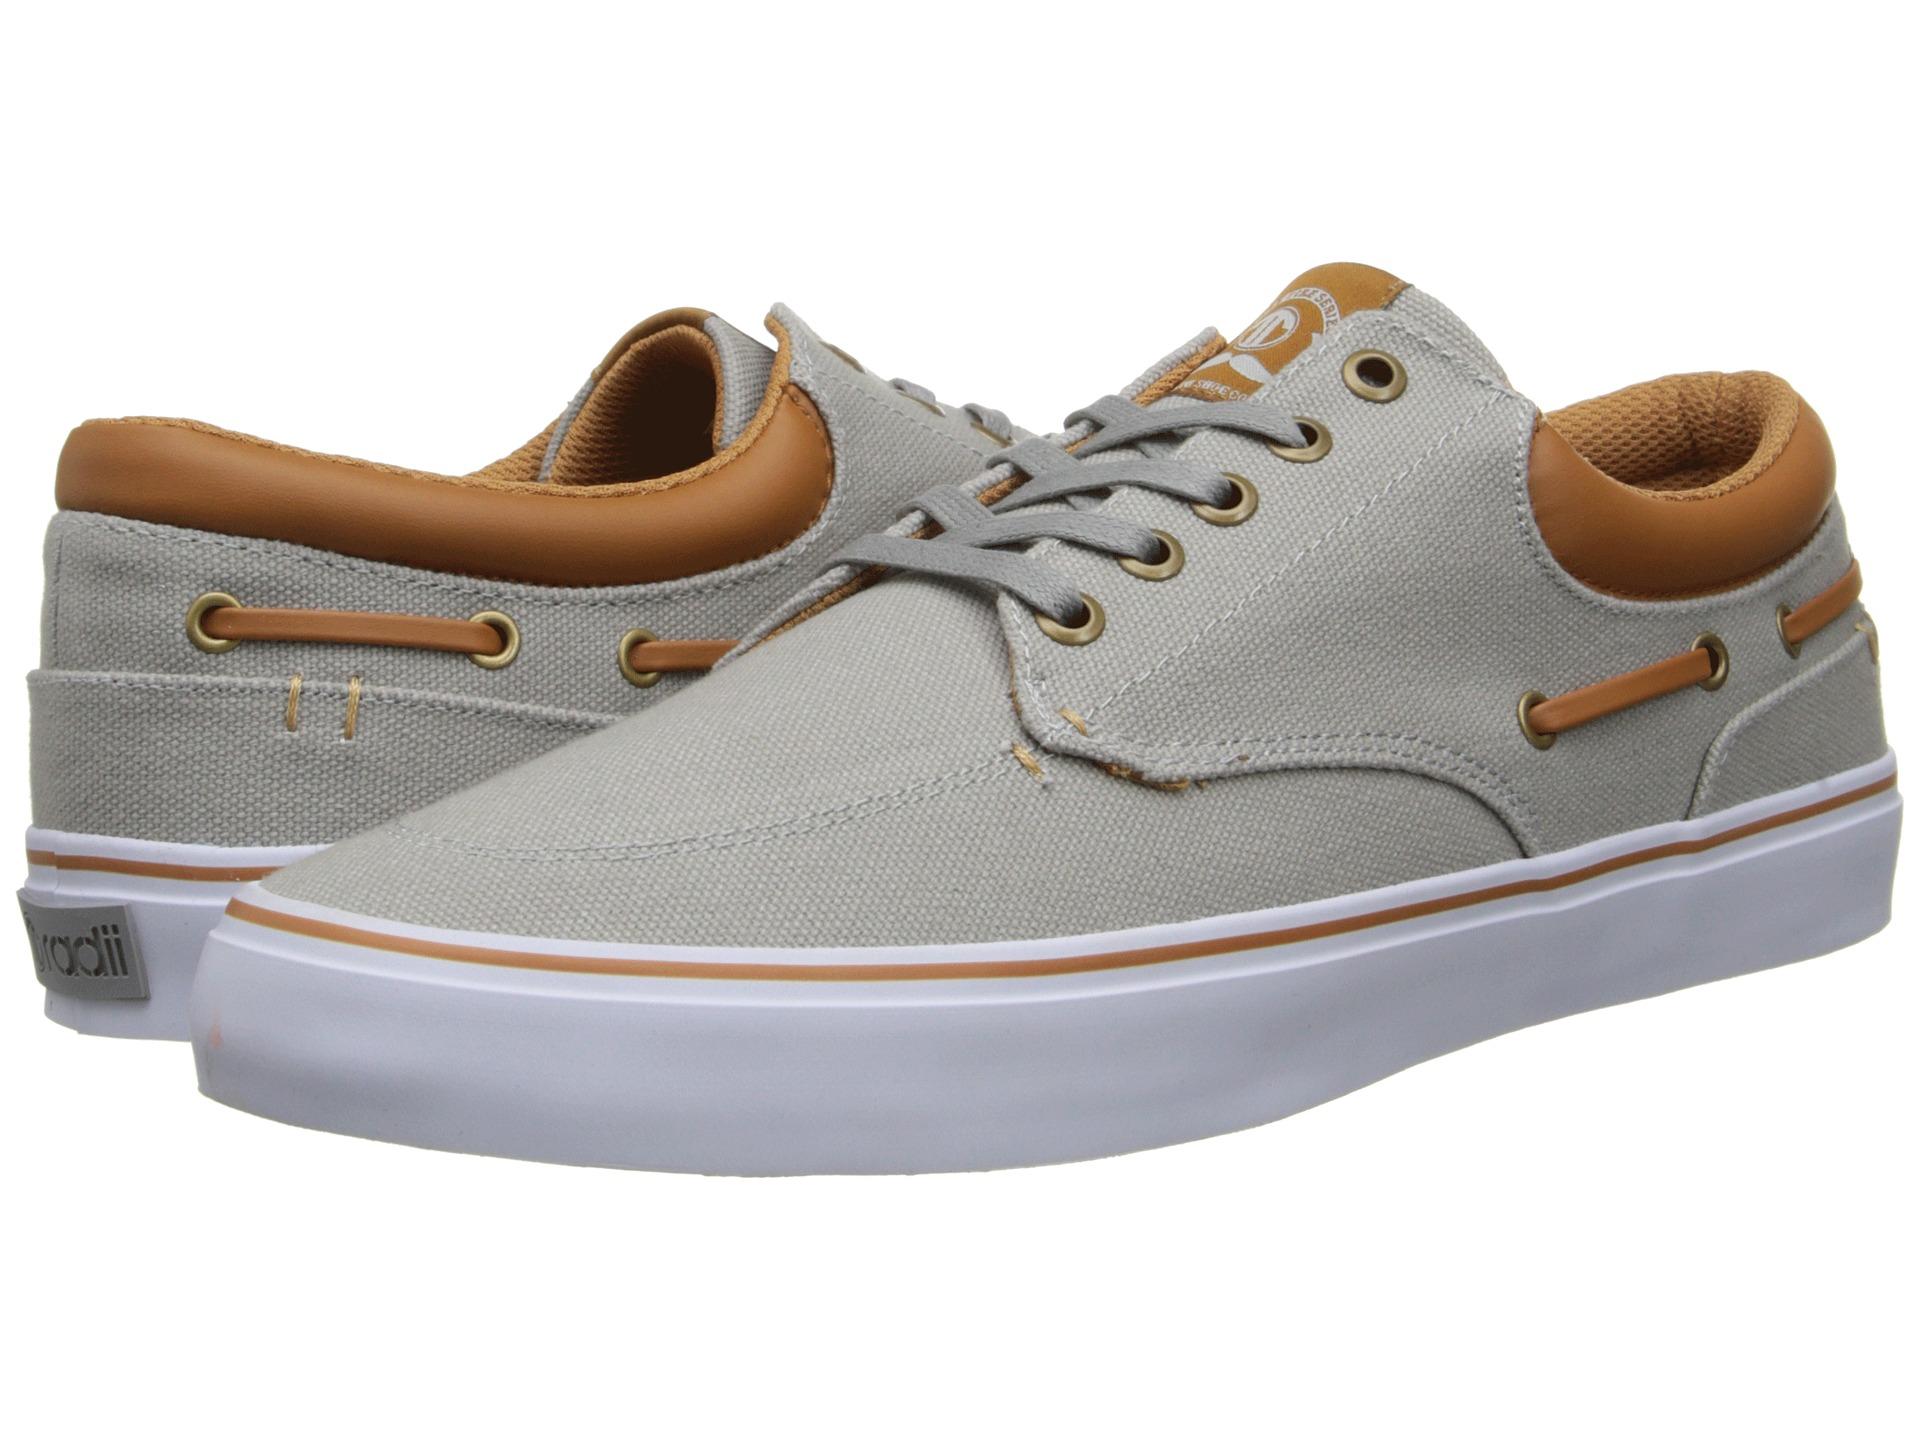 radii footwear deck grey brown canvas zappos free